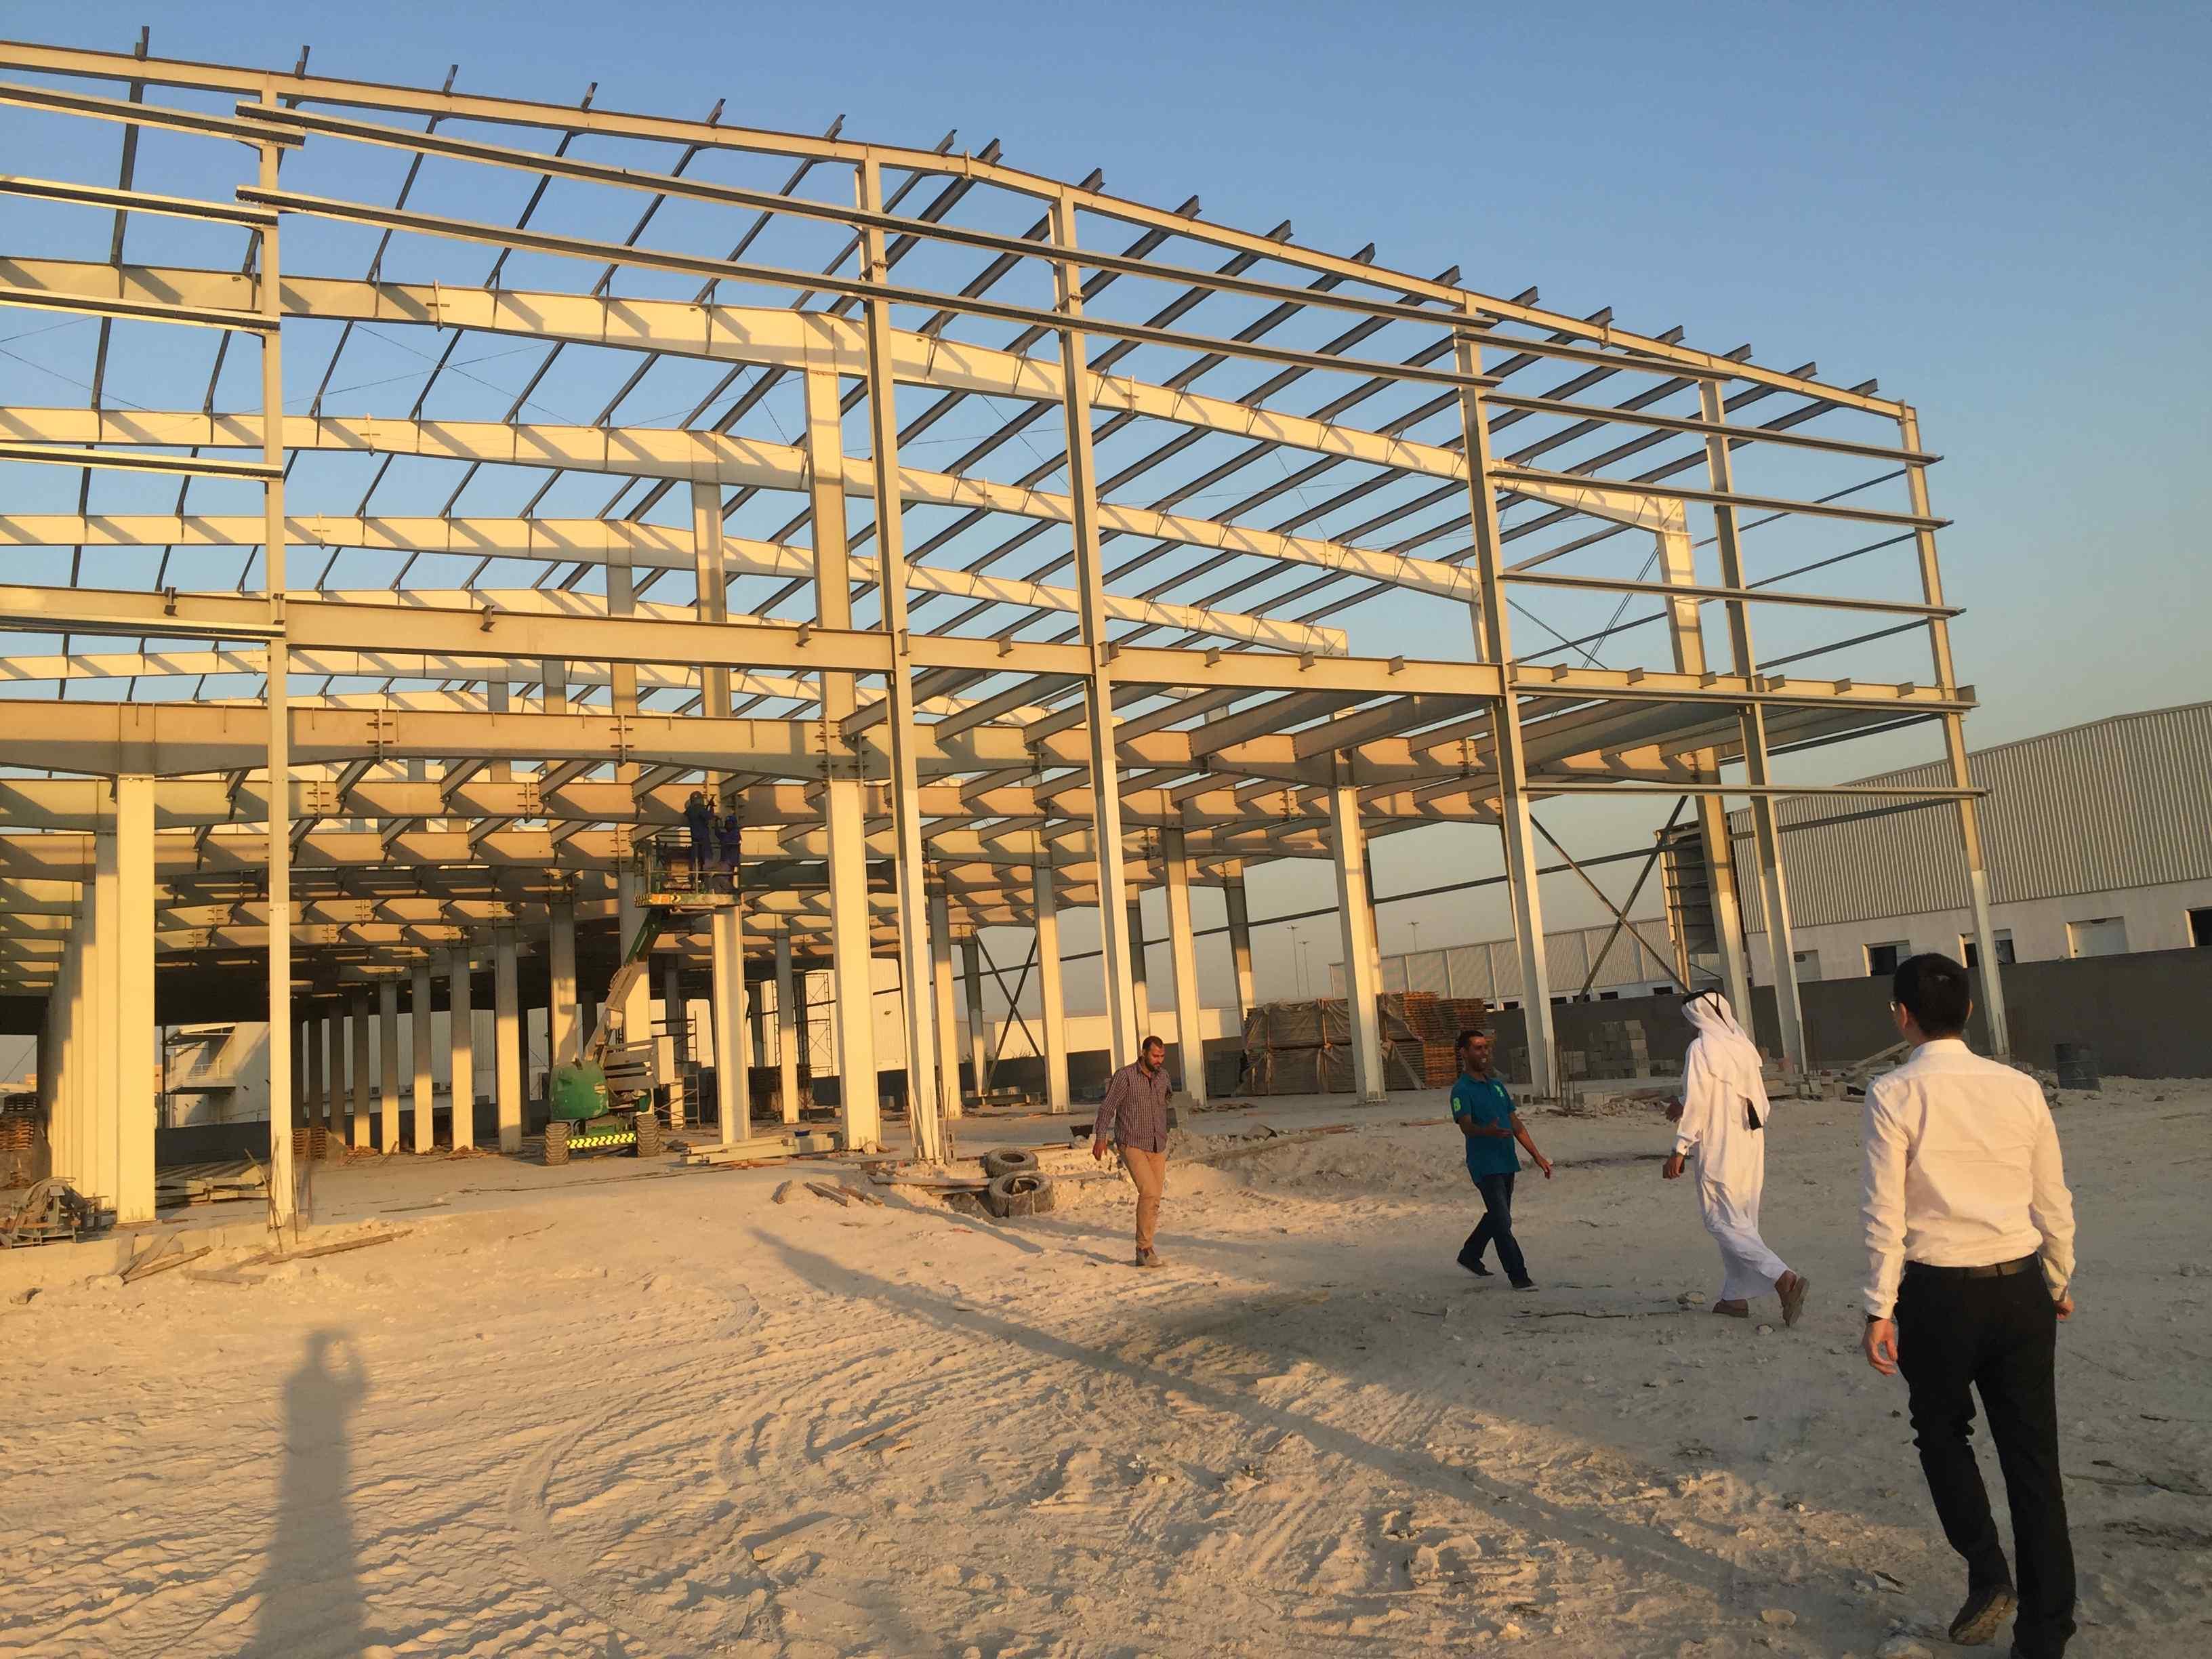 Qatar Construction Site